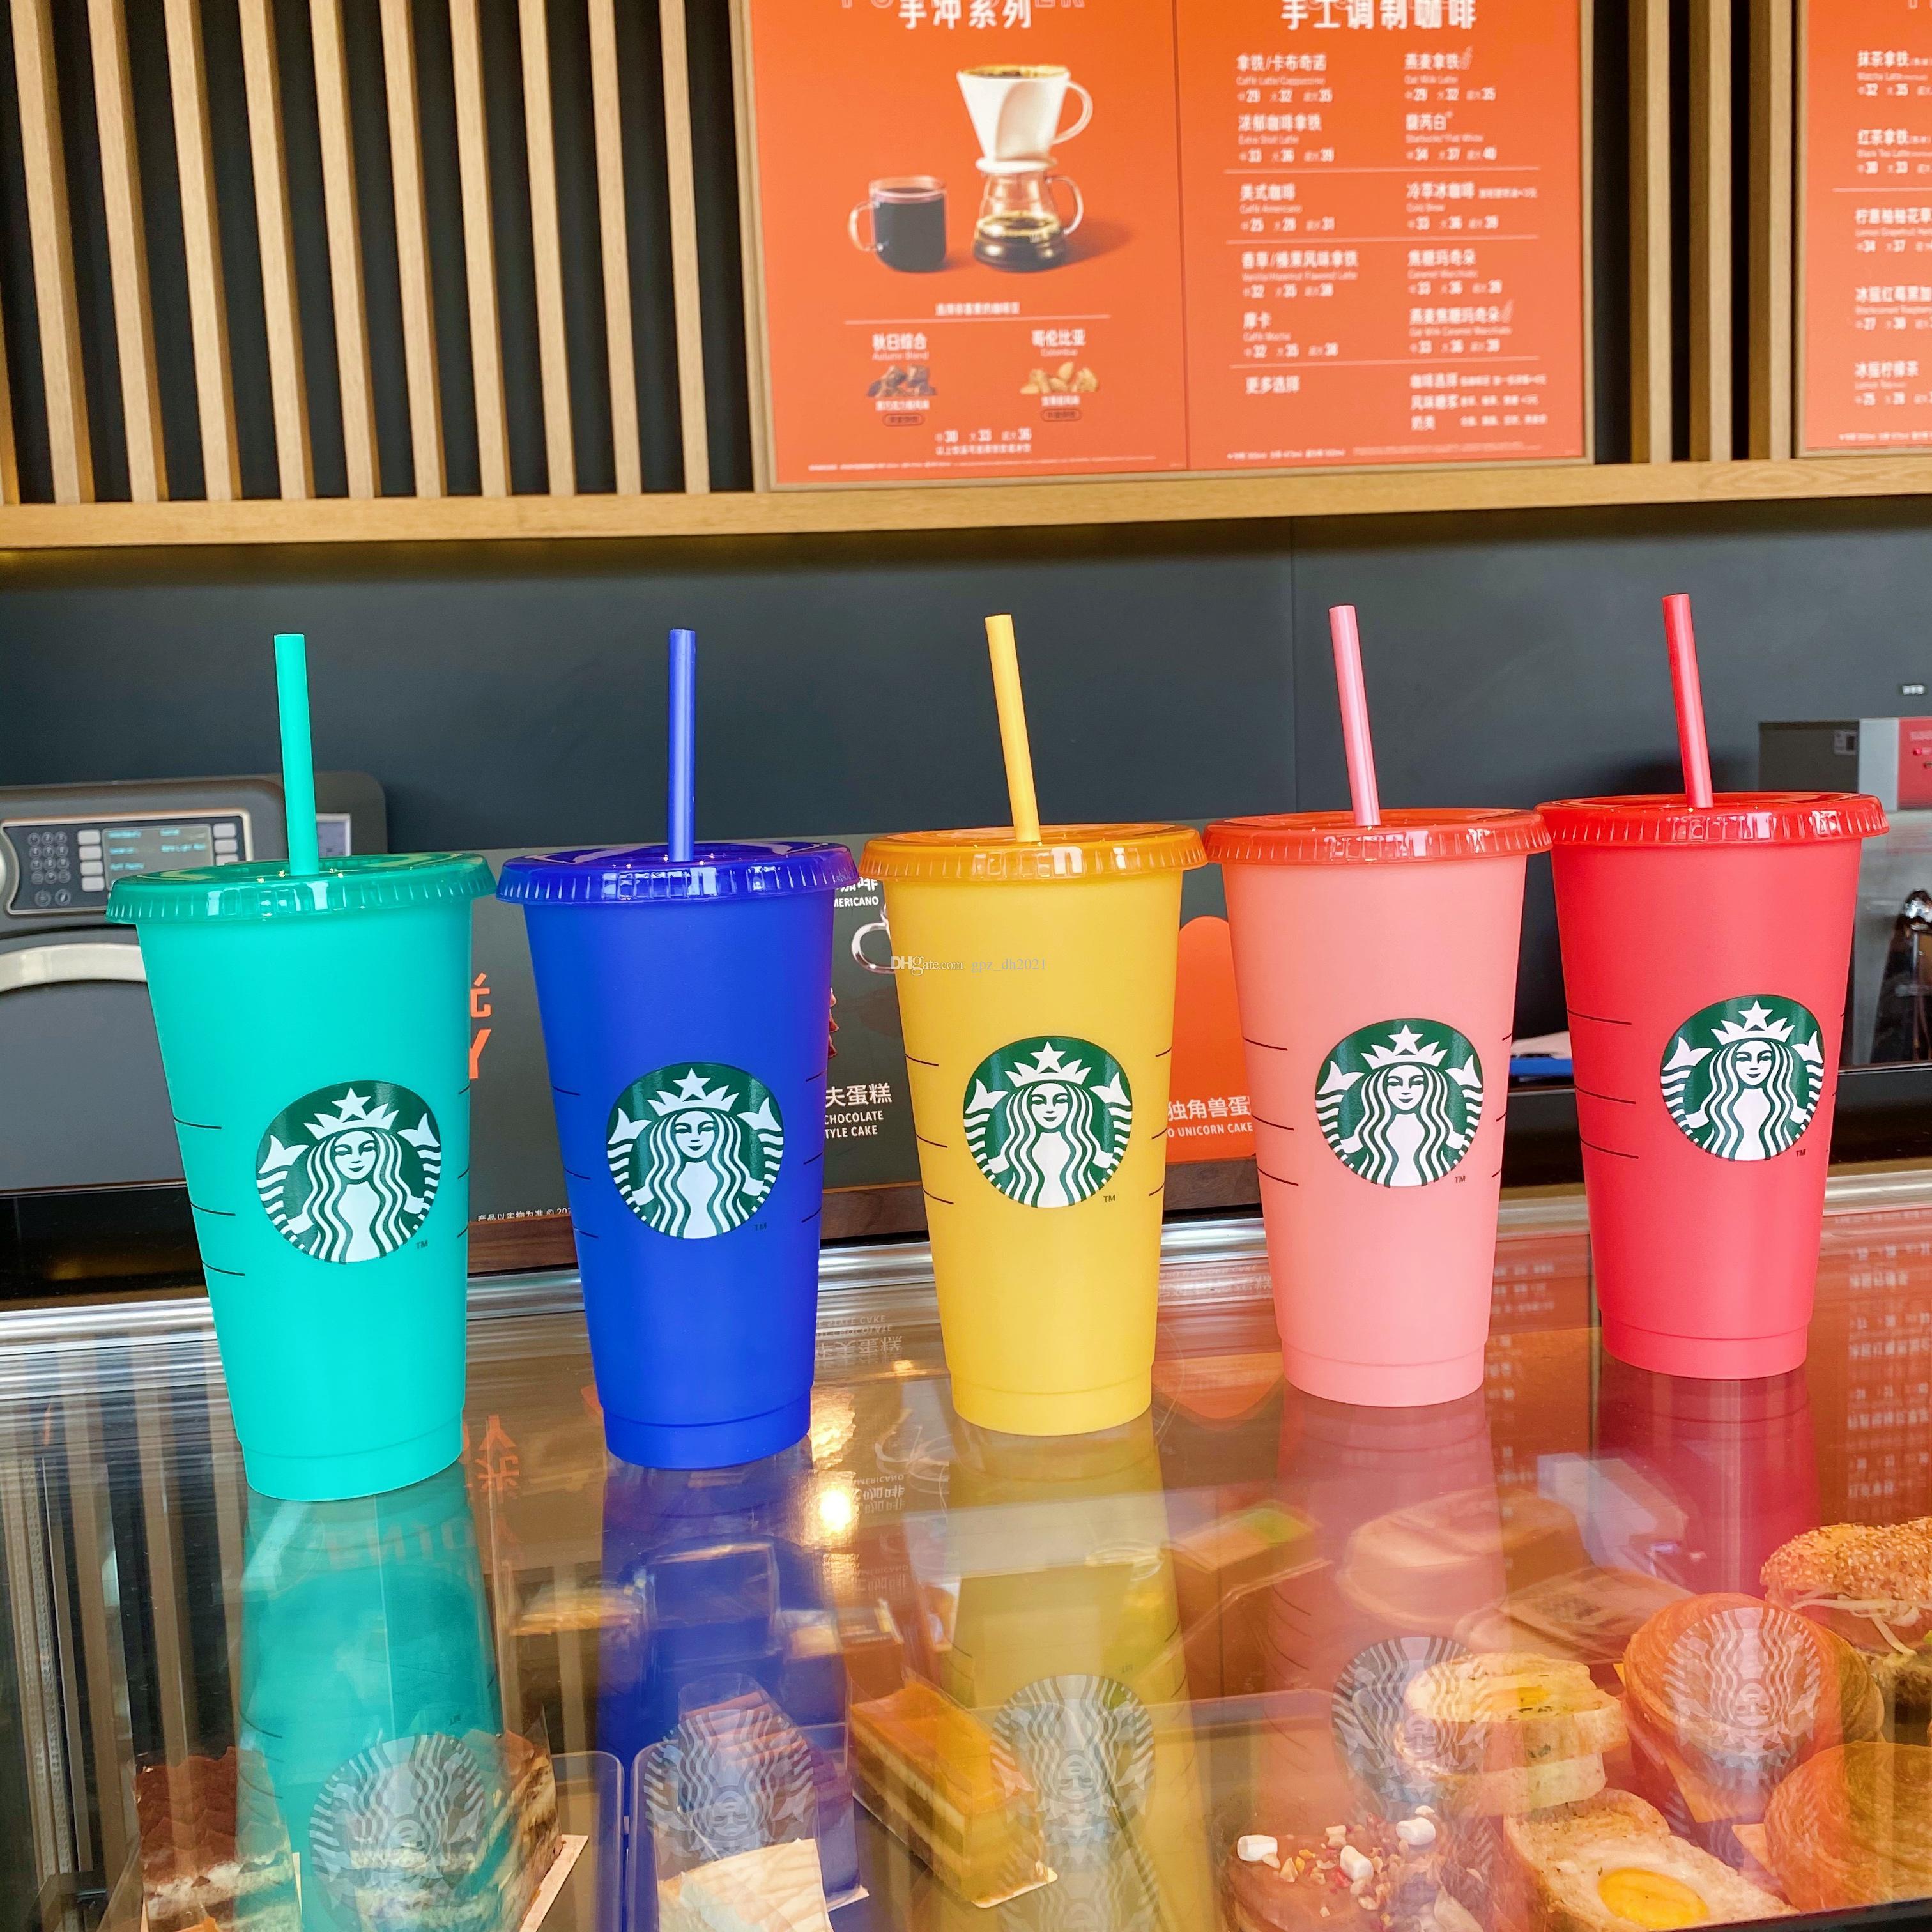 Starbucks 24oz اللون تغيير المروم البلاستيك شفافة شرب عصير كوب مع الشفاه و القش سحر القهوة القدح كوستوم اللون تغيير محفظة 5PCS